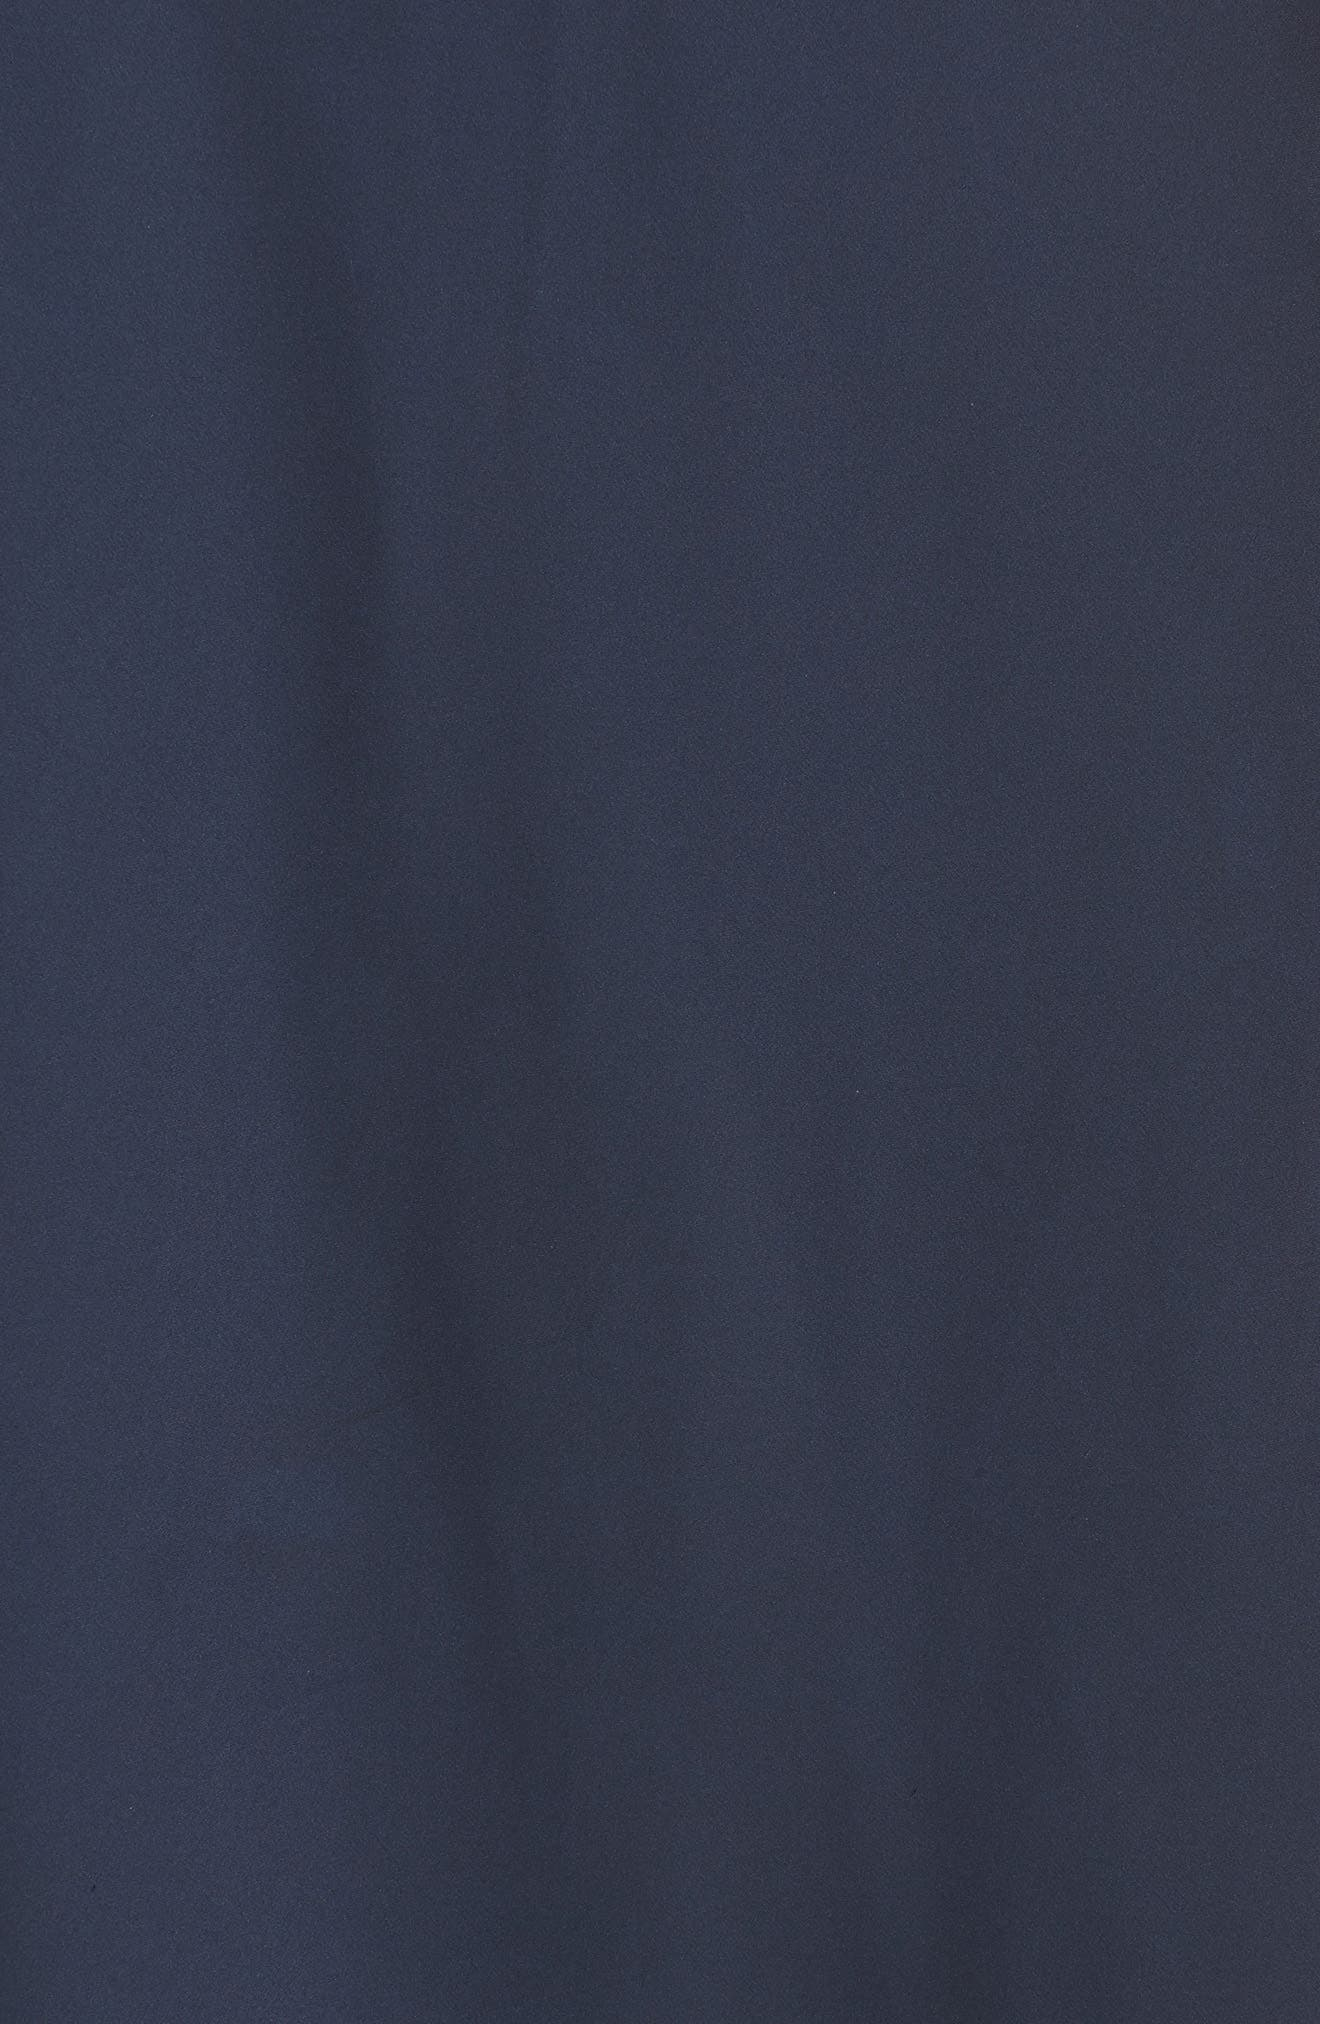 x Atlantic-Pacific Lace Trim Half Slip,                             Alternate thumbnail 5, color,                             NAVY BLAZER